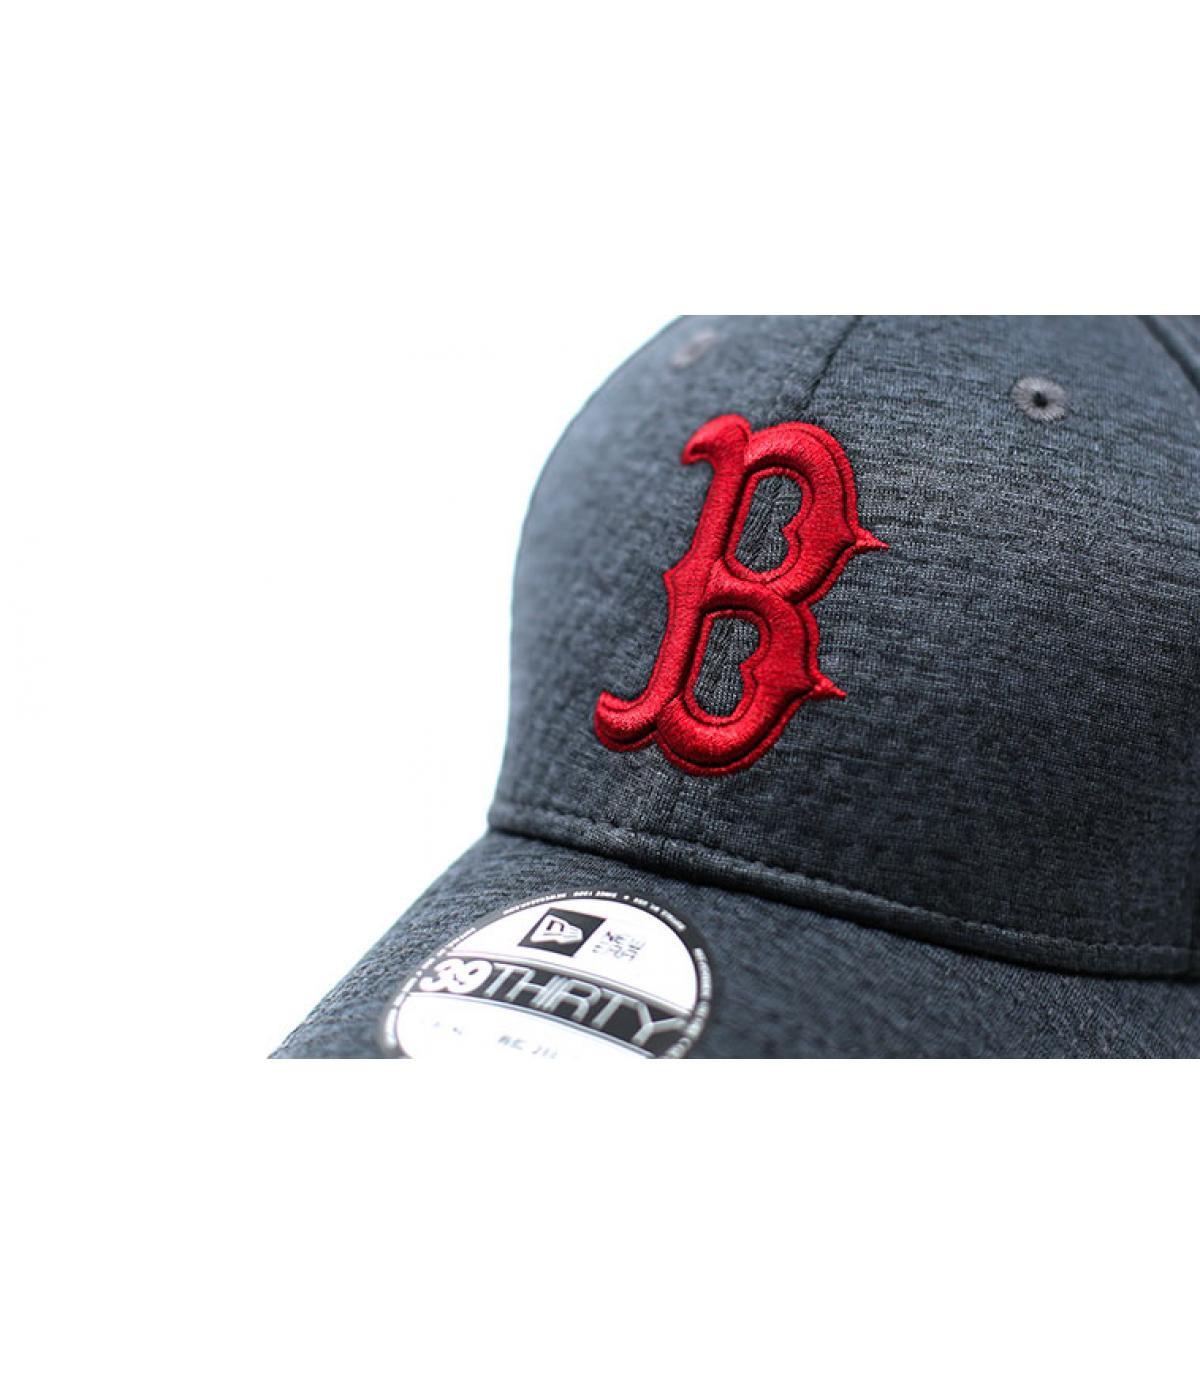 Détails Boston Dryswitch Jersey 39Thirty black cardinal - image 3